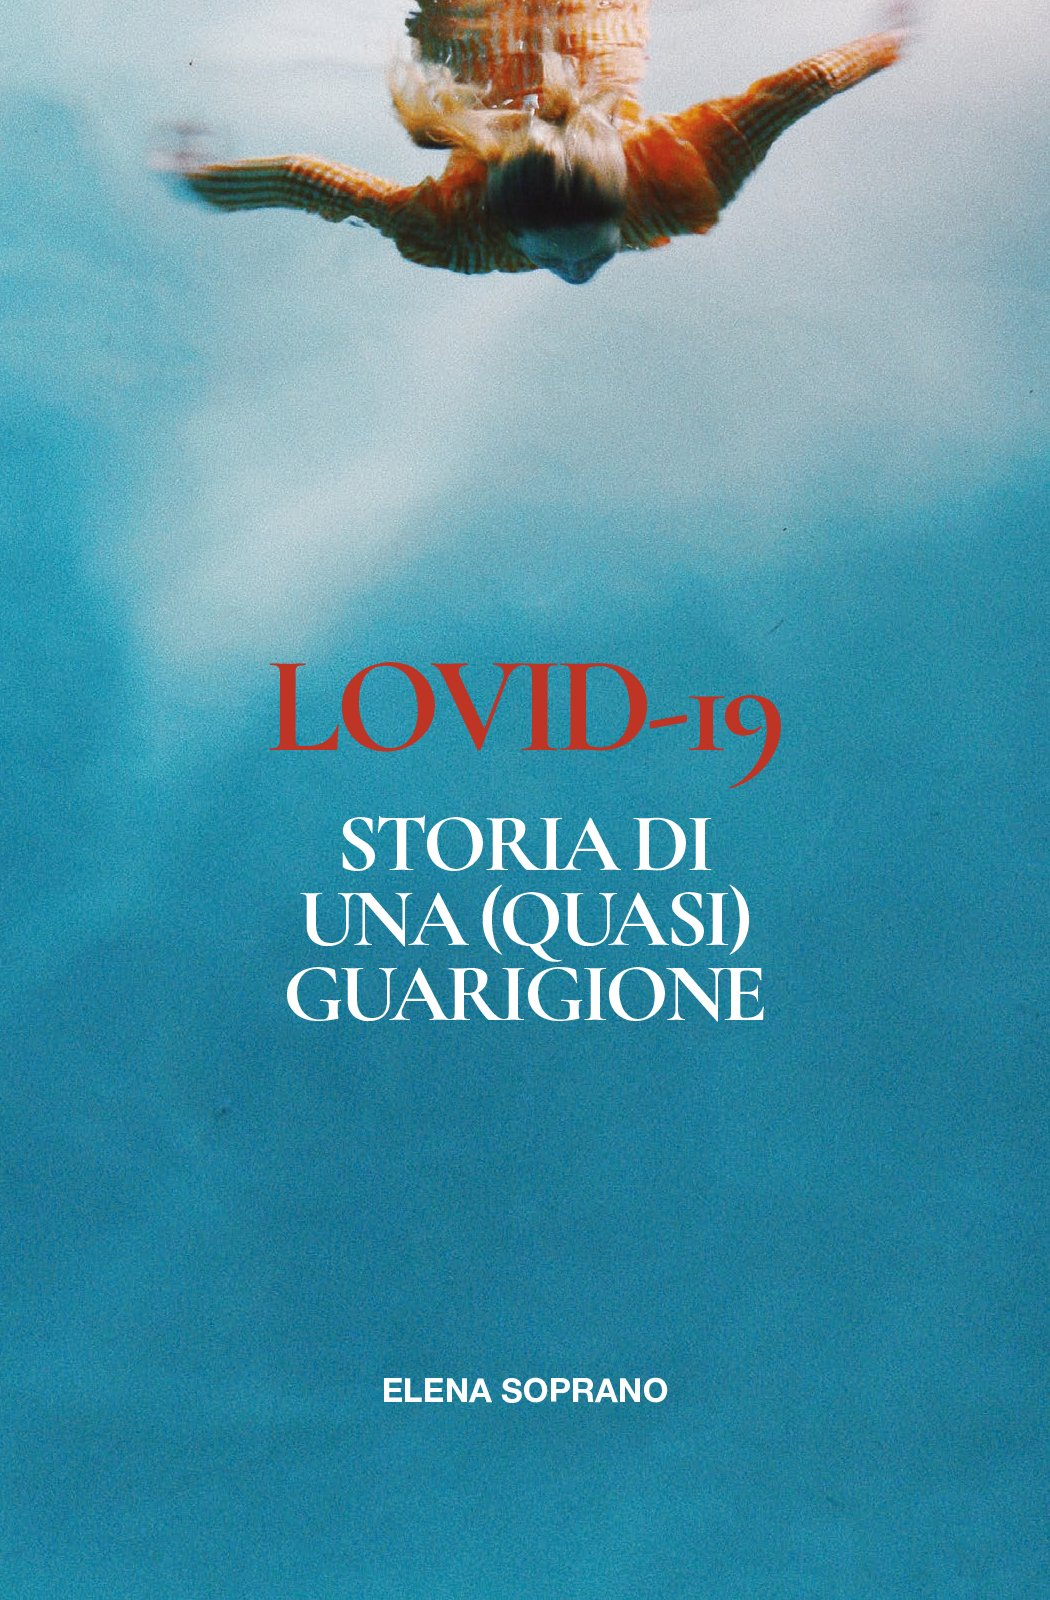 Lovid19 copertina